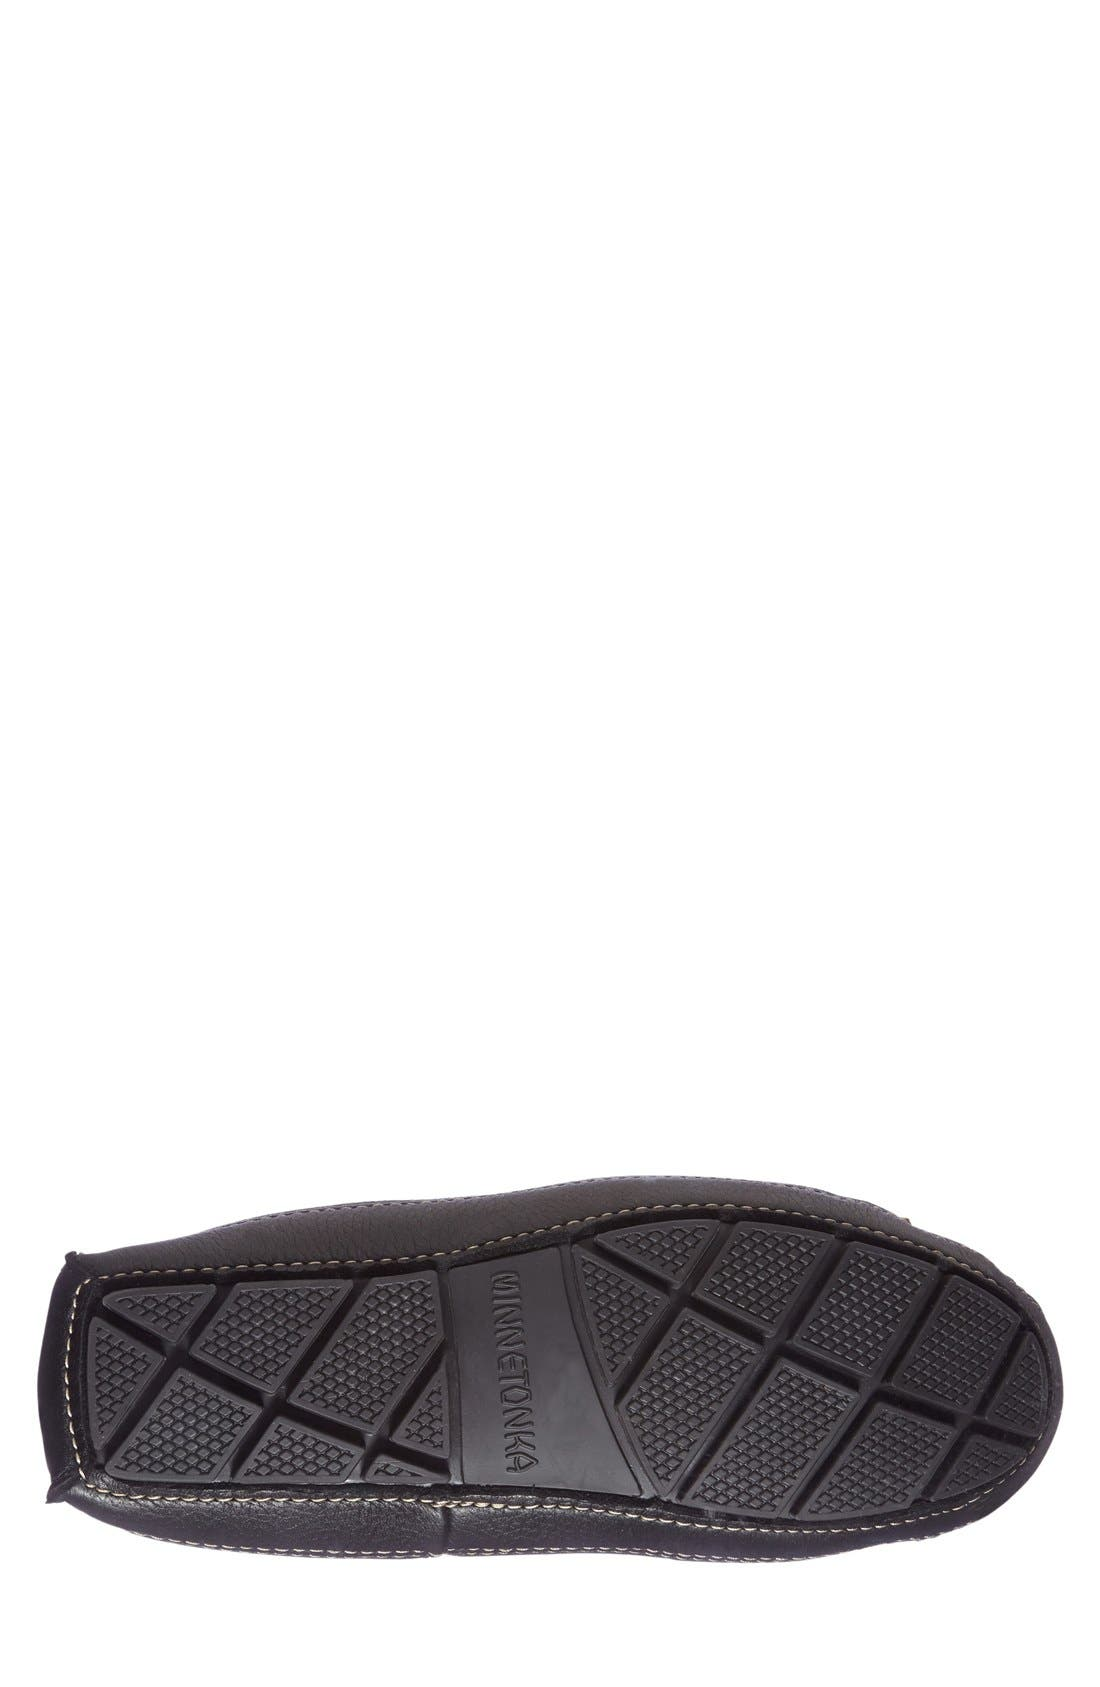 Genuine Shearling Leather Slipper,                             Alternate thumbnail 4, color,                             BLACK